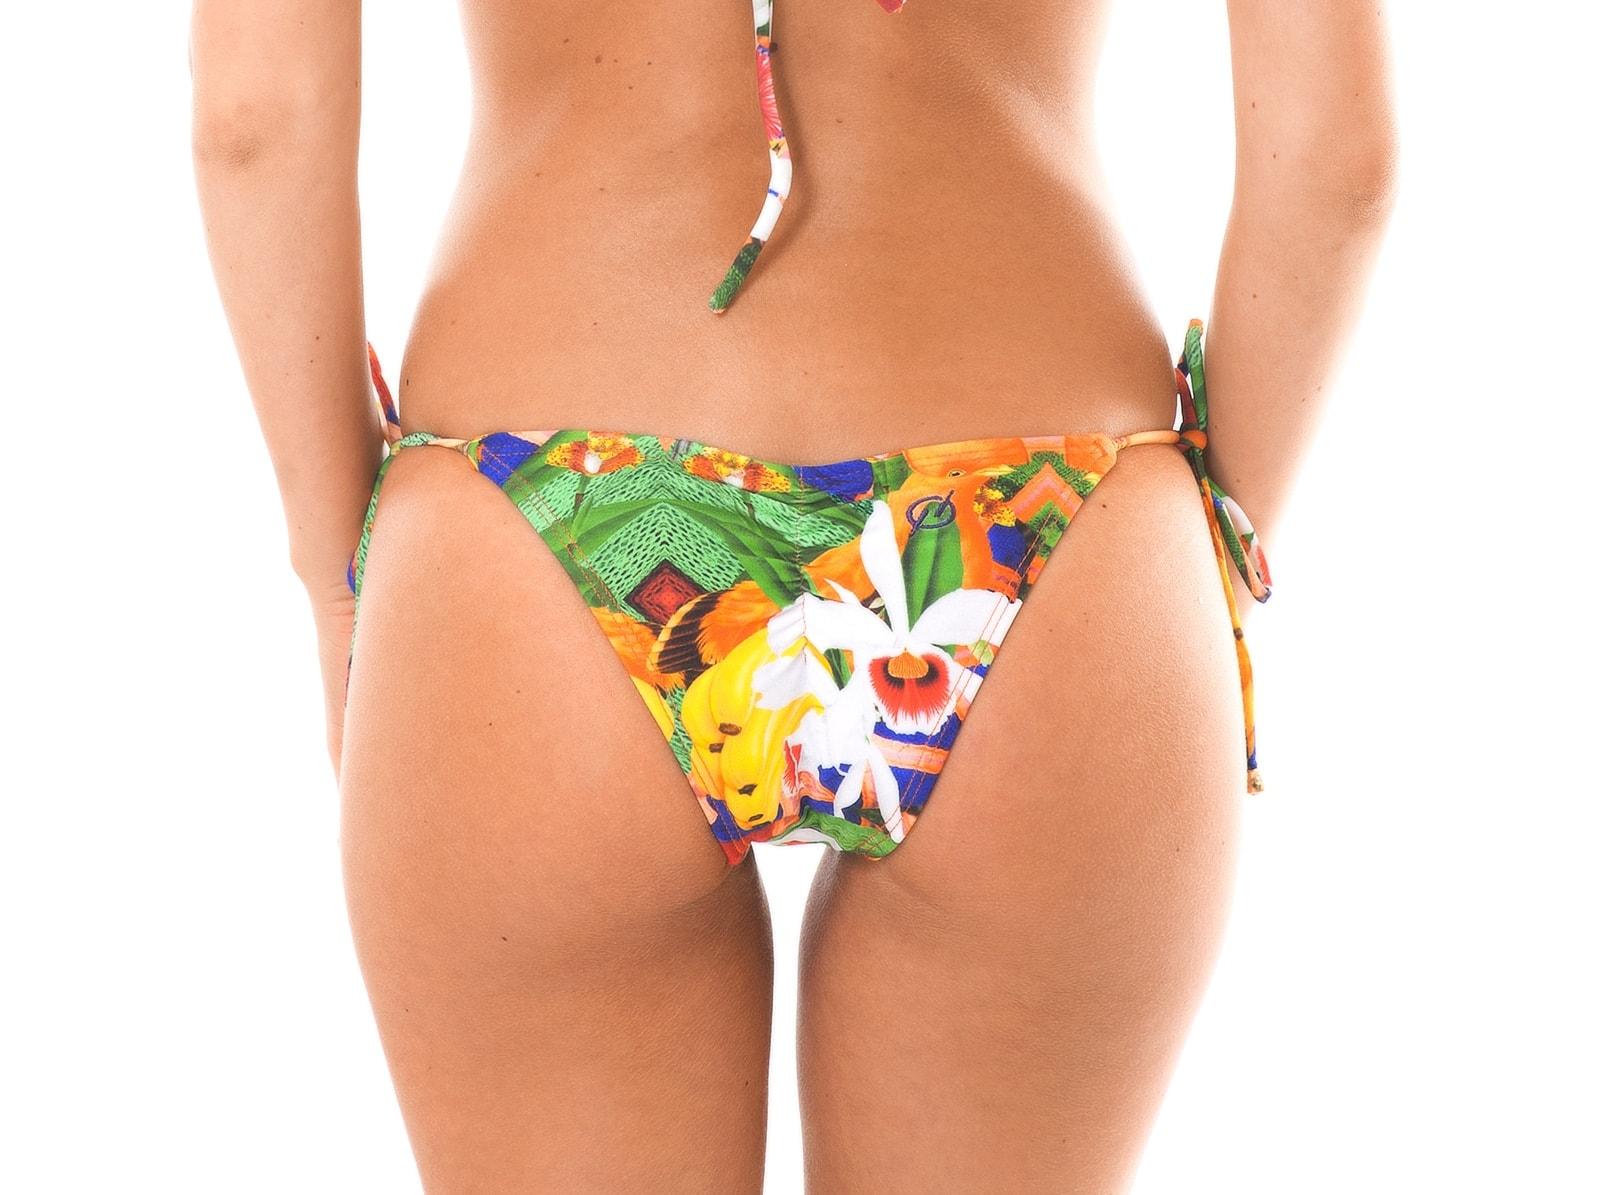 Bikini bottom string